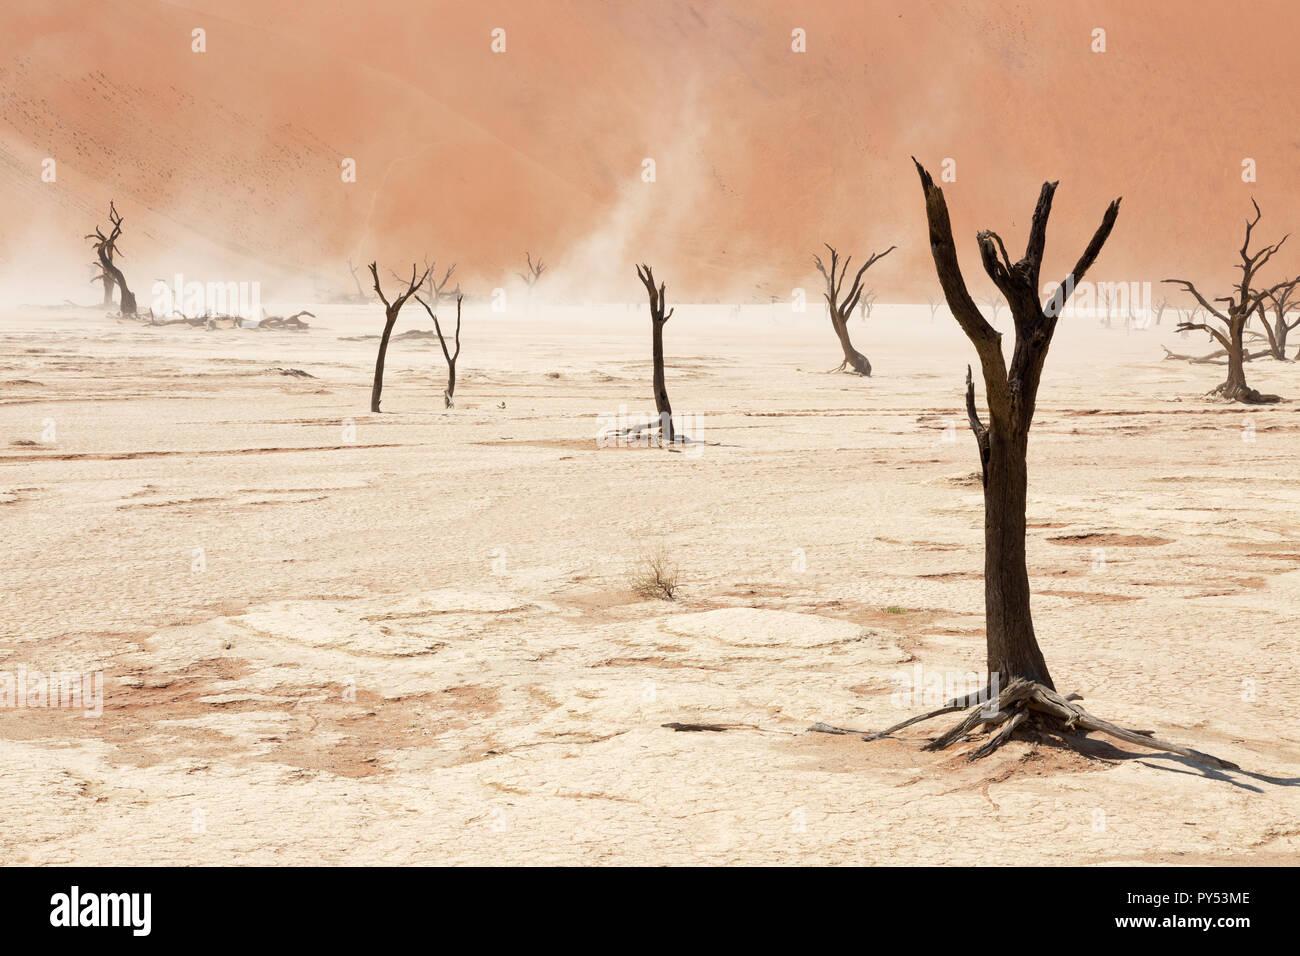 Deadvlei Namibia Africa - wind stirs up sand and salt among the dead trees, Deadvlei, Sossusvlei, Namib Desert, Namib Naukluft National Park, Namibia Stock Photo